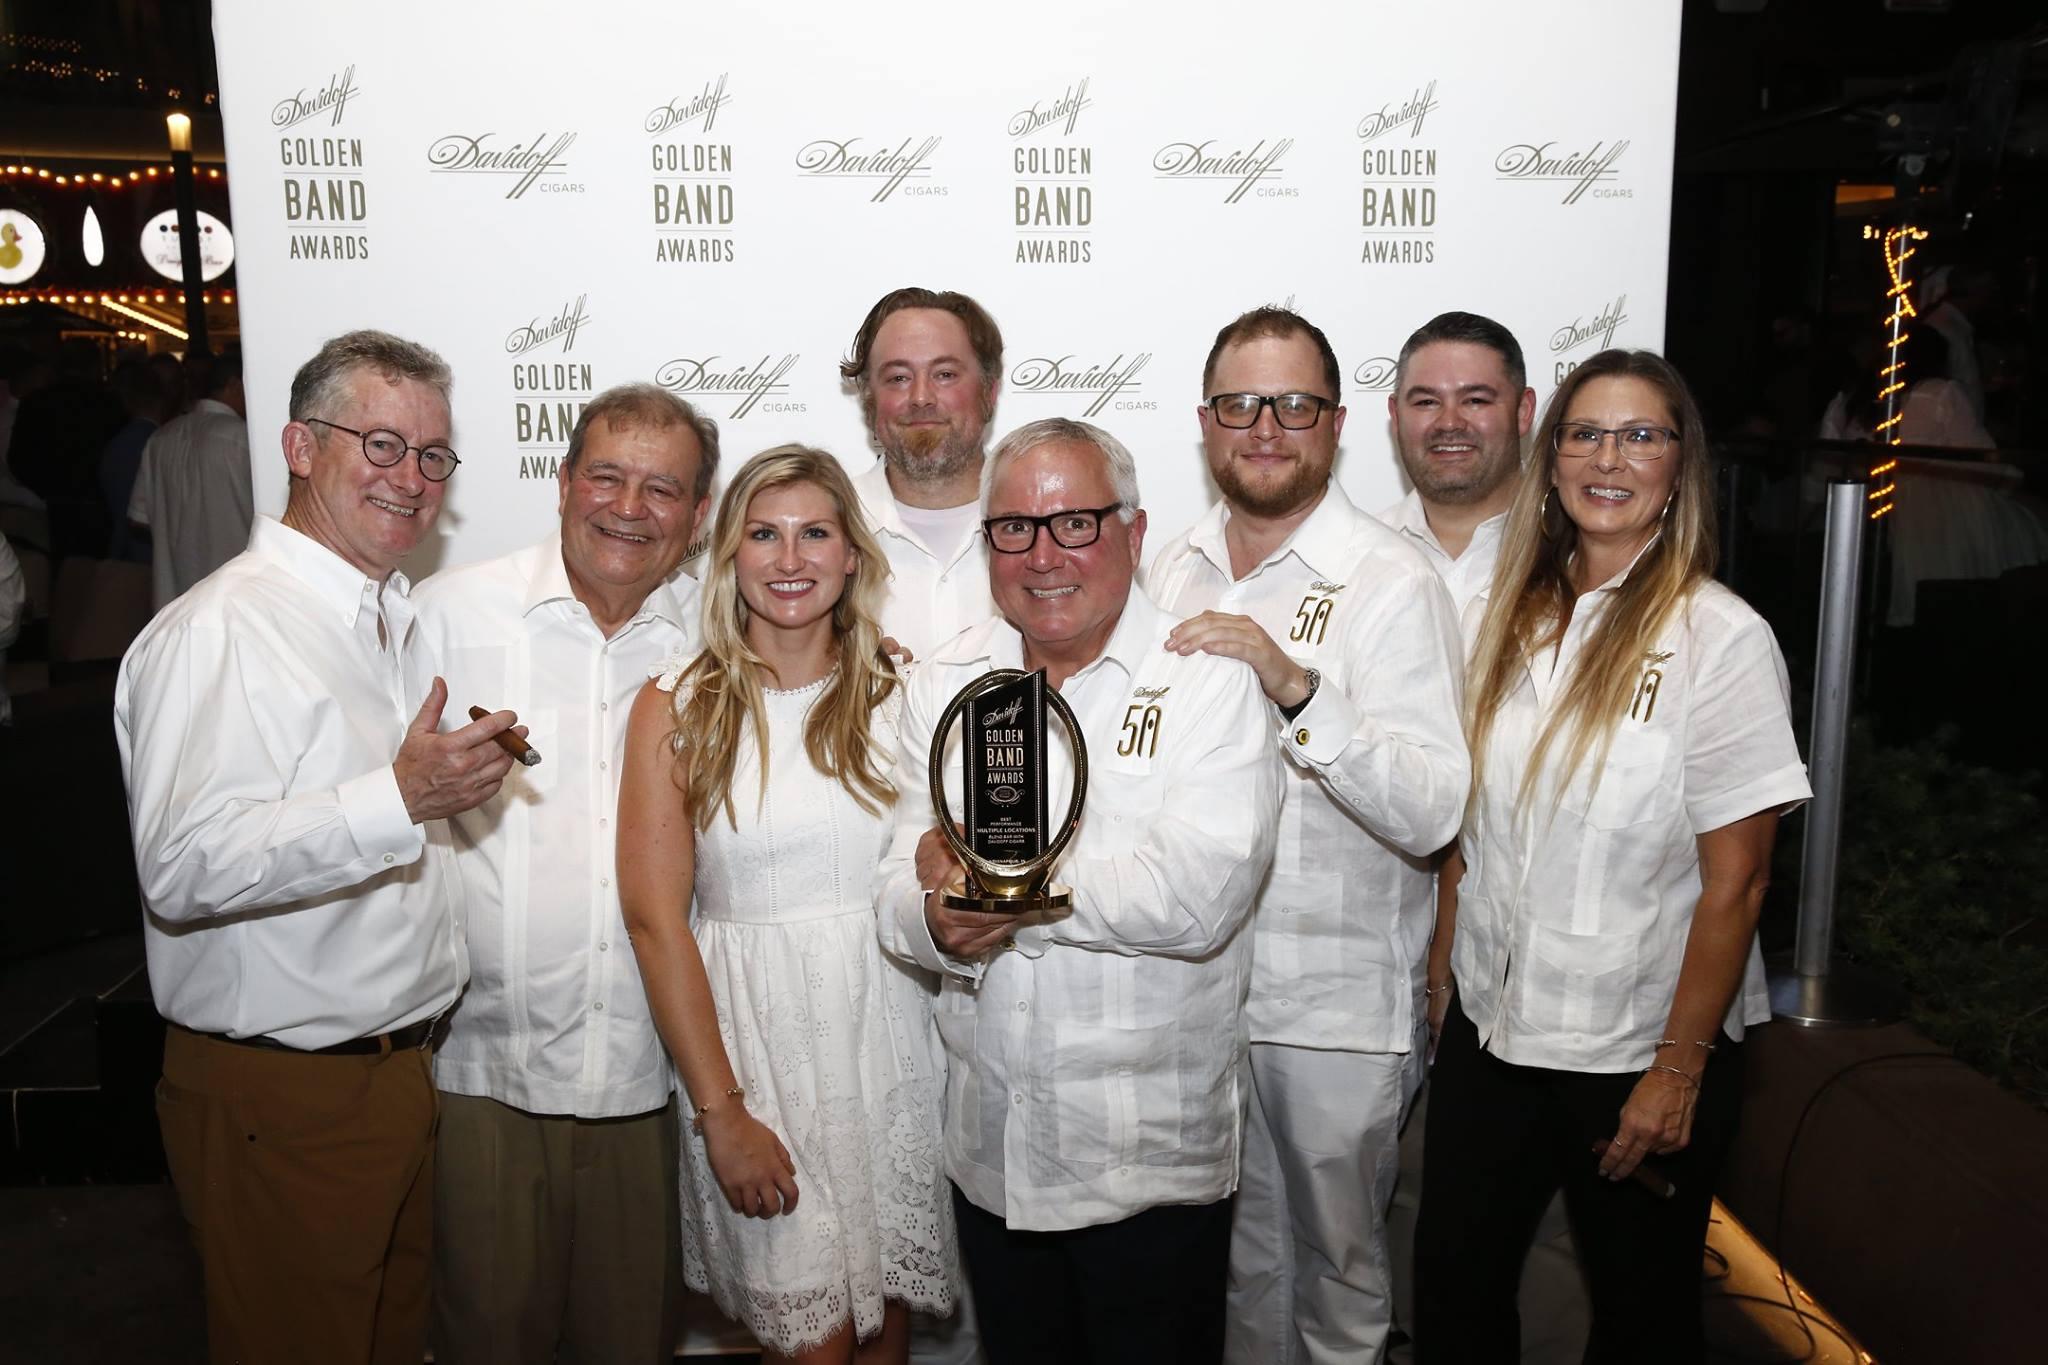 golden band awards davidoff